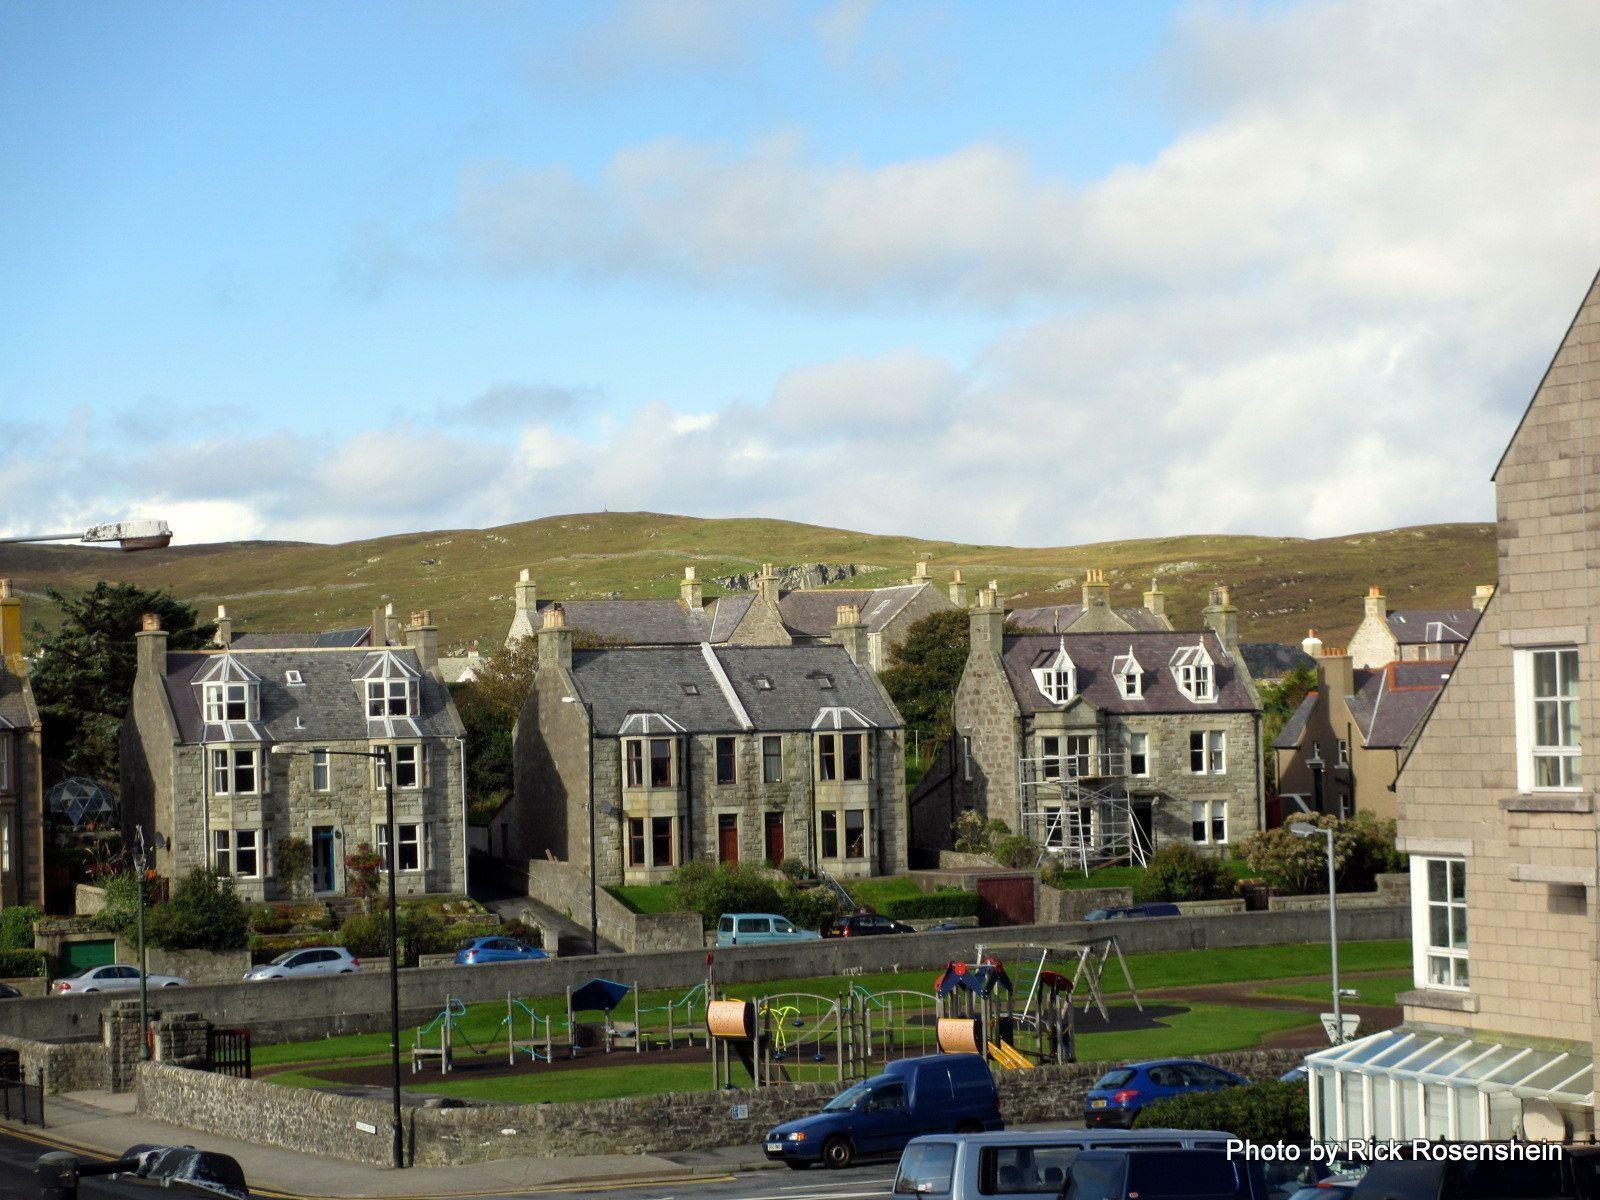 Lerwick, Shetland Islands #shetlandislands Lerwick, Shetland Islands #shetlandislands Lerwick, Shetland Islands #shetlandislands Lerwick, Shetland Islands #shetlandislands Lerwick, Shetland Islands #shetlandislands Lerwick, Shetland Islands #shetlandislands Lerwick, Shetland Islands #shetlandislands Lerwick, Shetland Islands #shetlandislands Lerwick, Shetland Islands #shetlandislands Lerwick, Shetland Islands #shetlandislands Lerwick, Shetland Islands #shetlandislands Lerwick, Shetland Islands # #shetlandislands